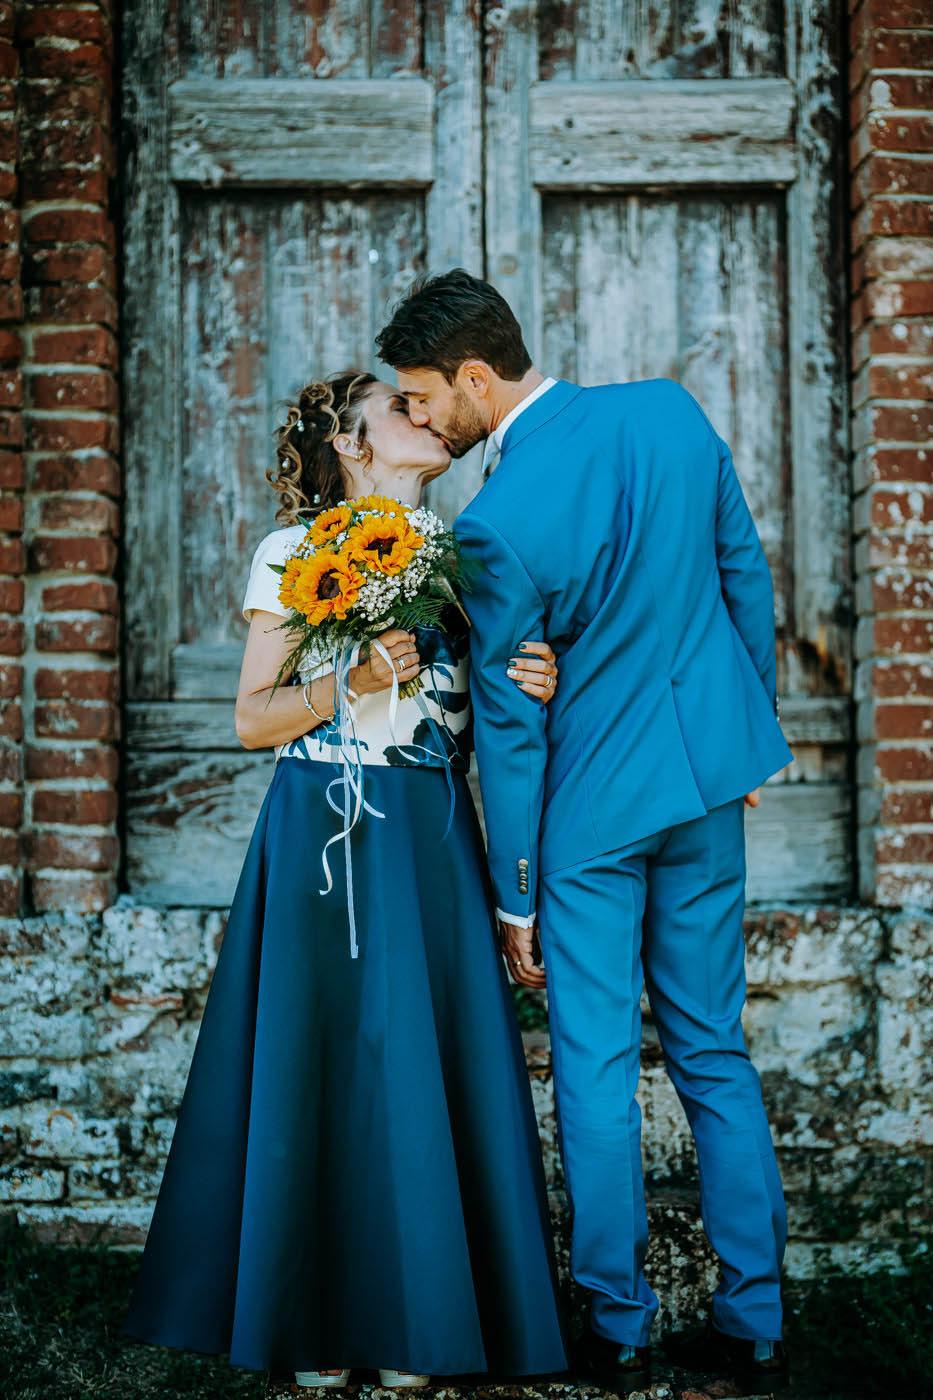 tuscany photographer wedding couple at the marriage ceremony